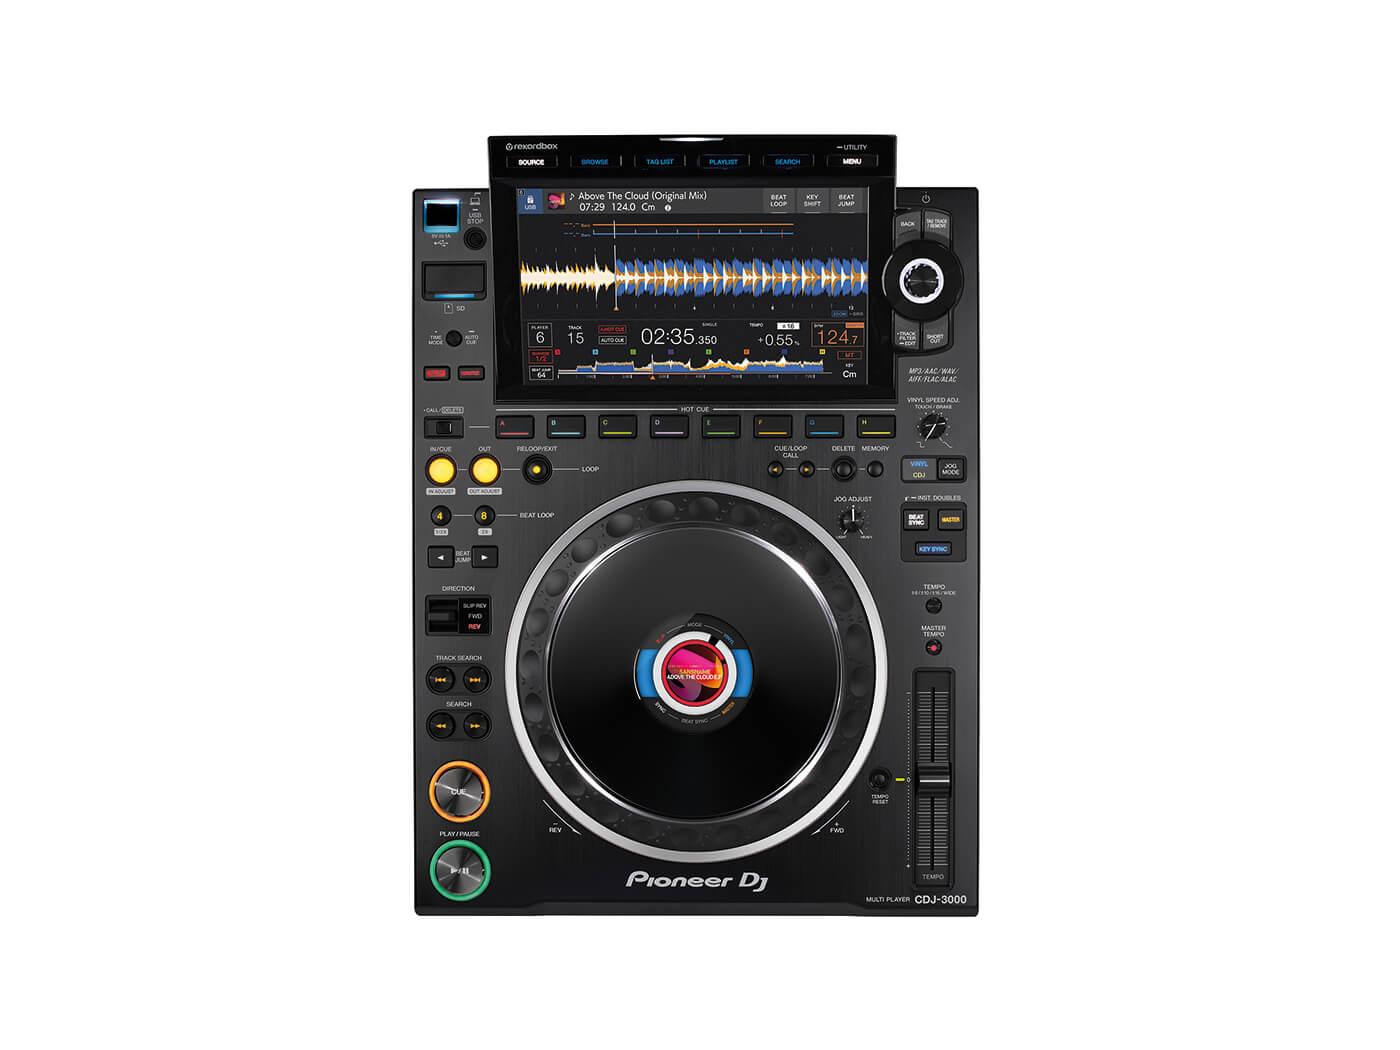 CDJ 3000 TOP WHITE@1400x1050 - Pioneer CDJ-3000 Evaluate